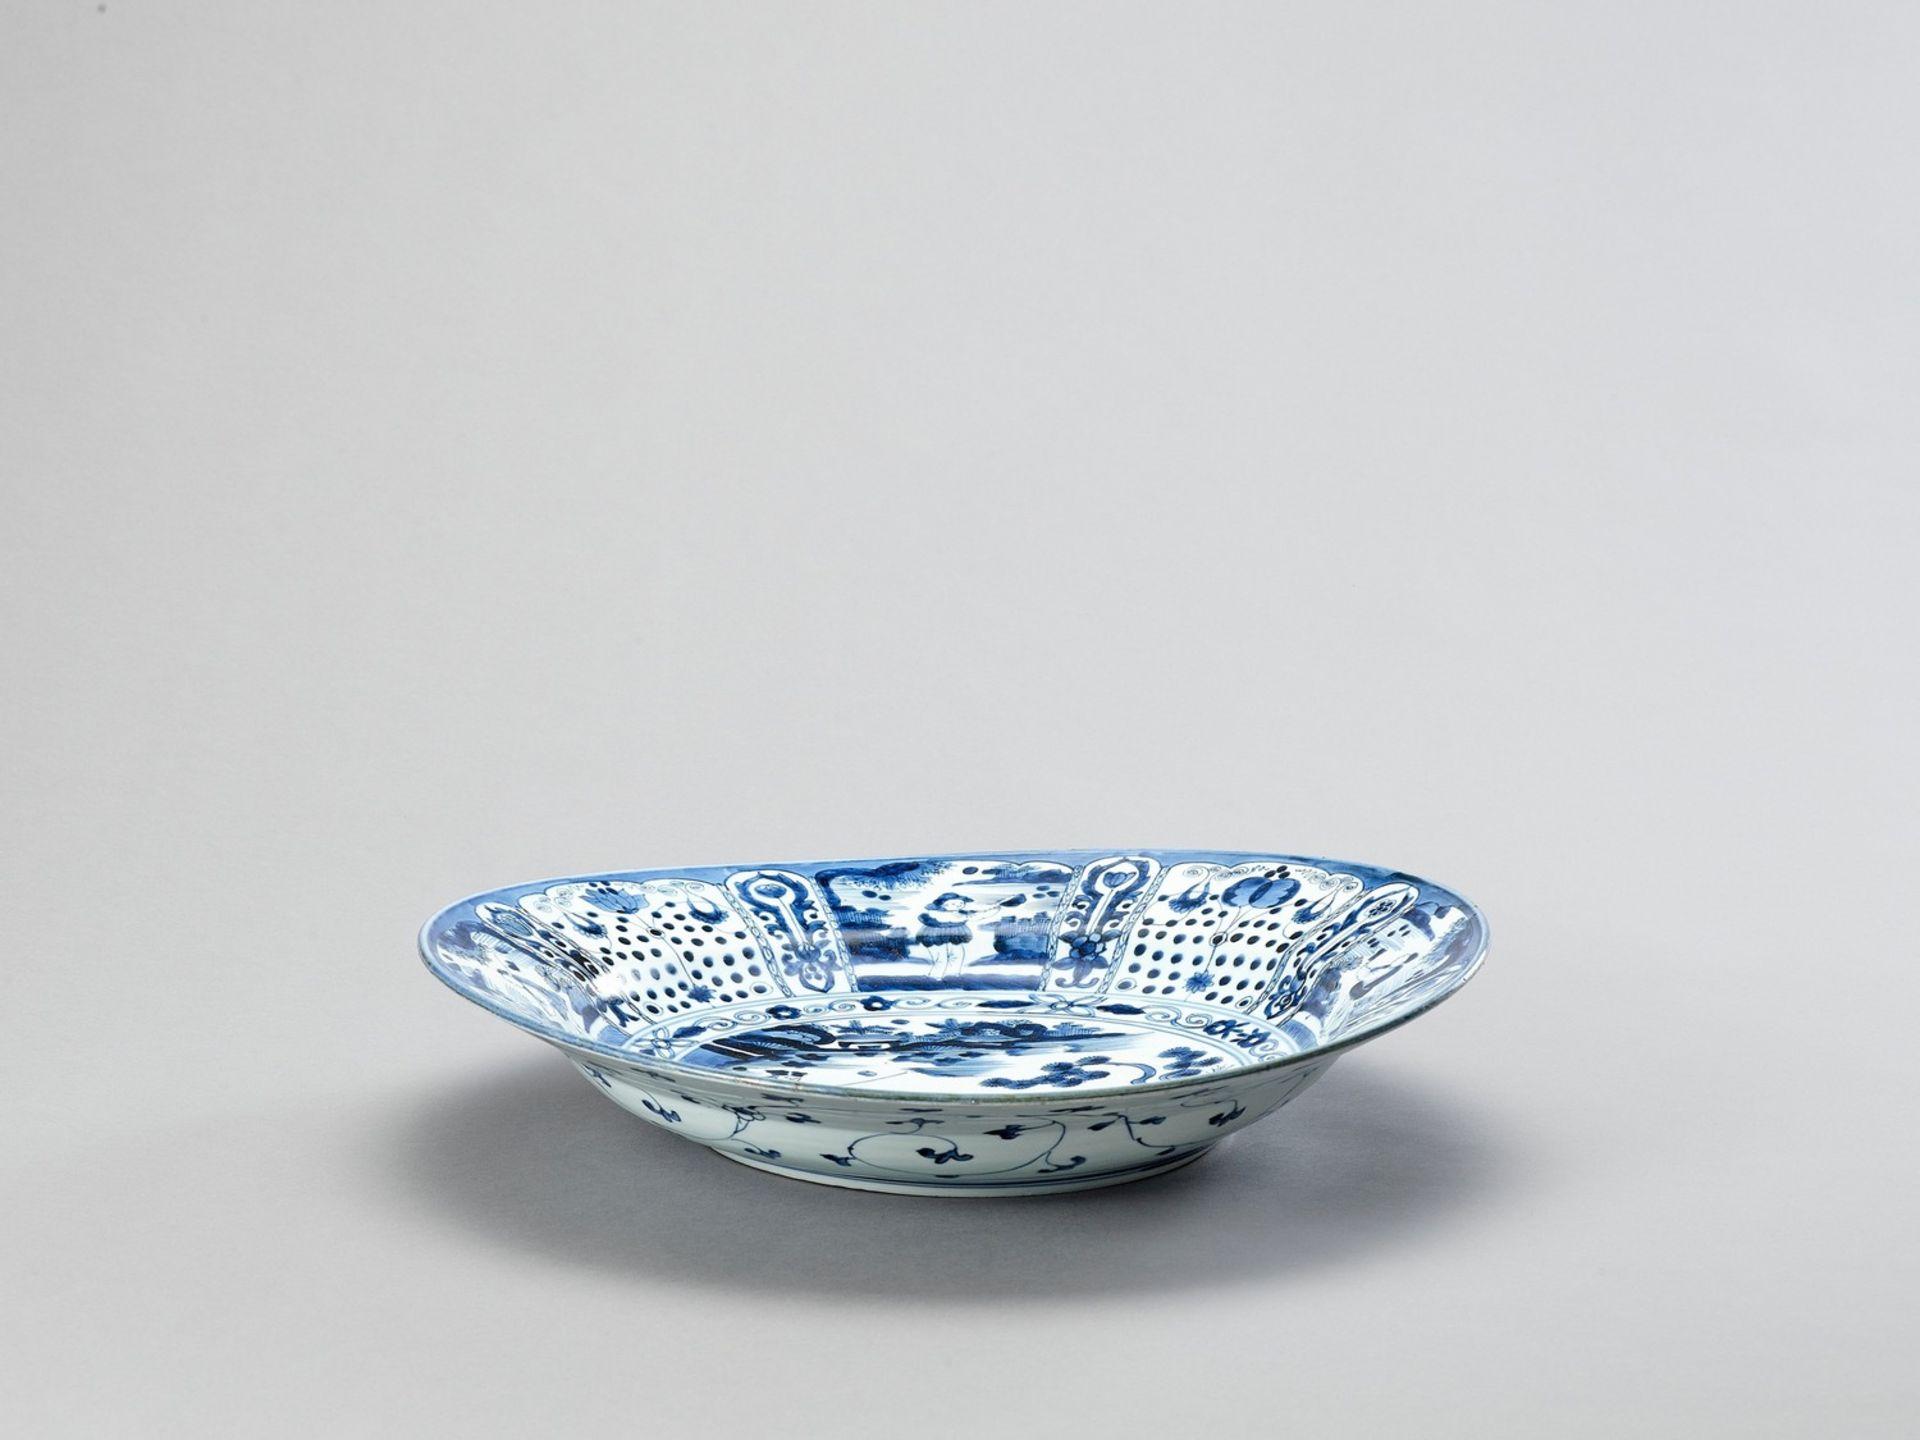 A LARGE BLUE AND WHITE PORCELAIN CHARGER - Bild 4 aus 5